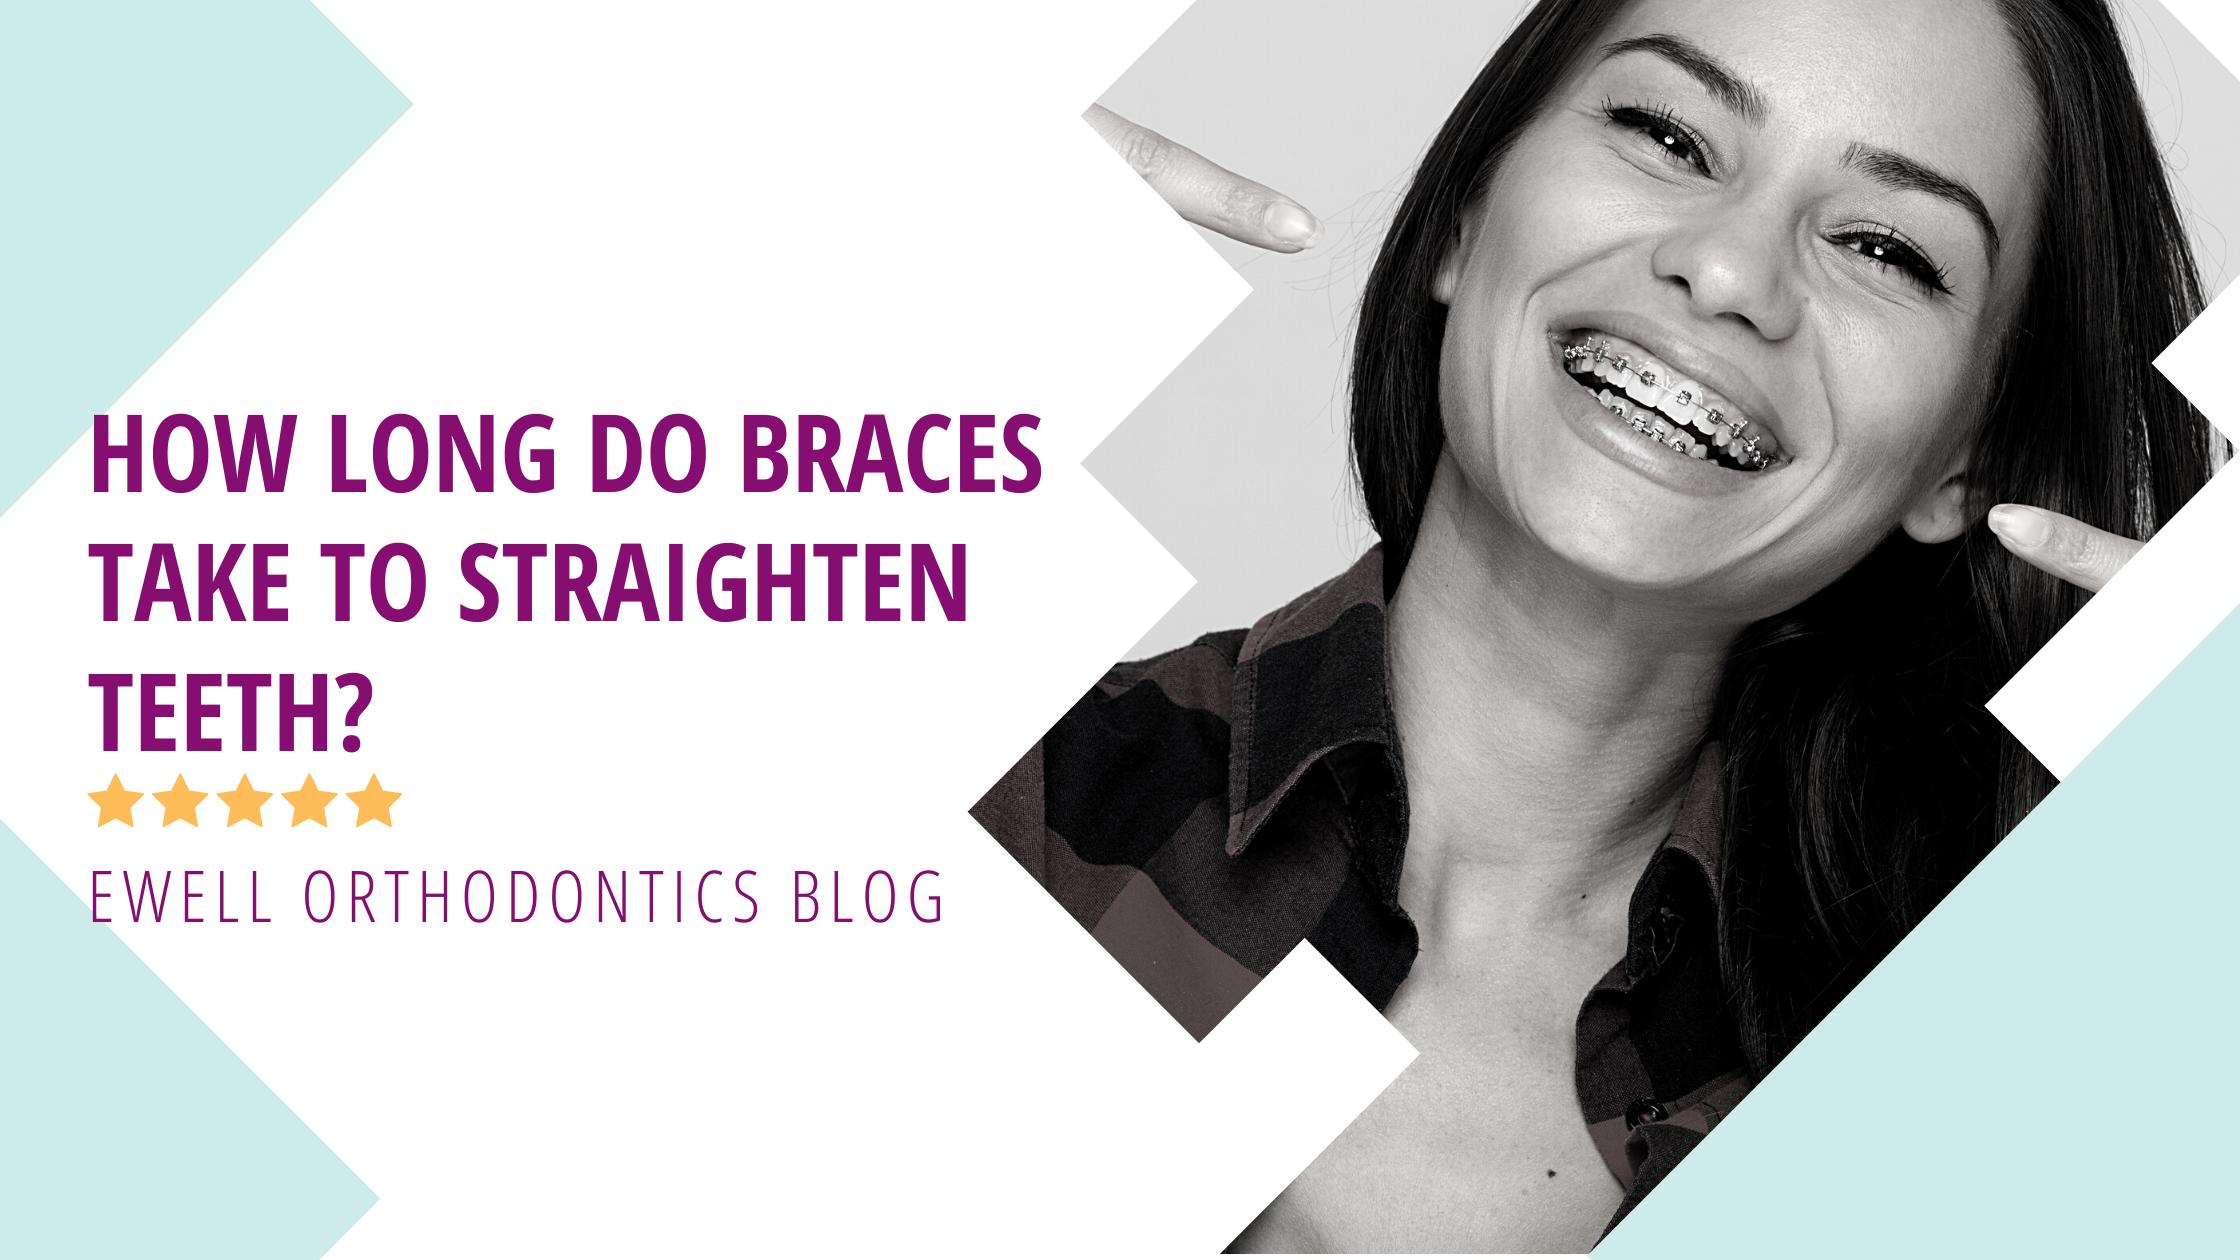 How long do braces take